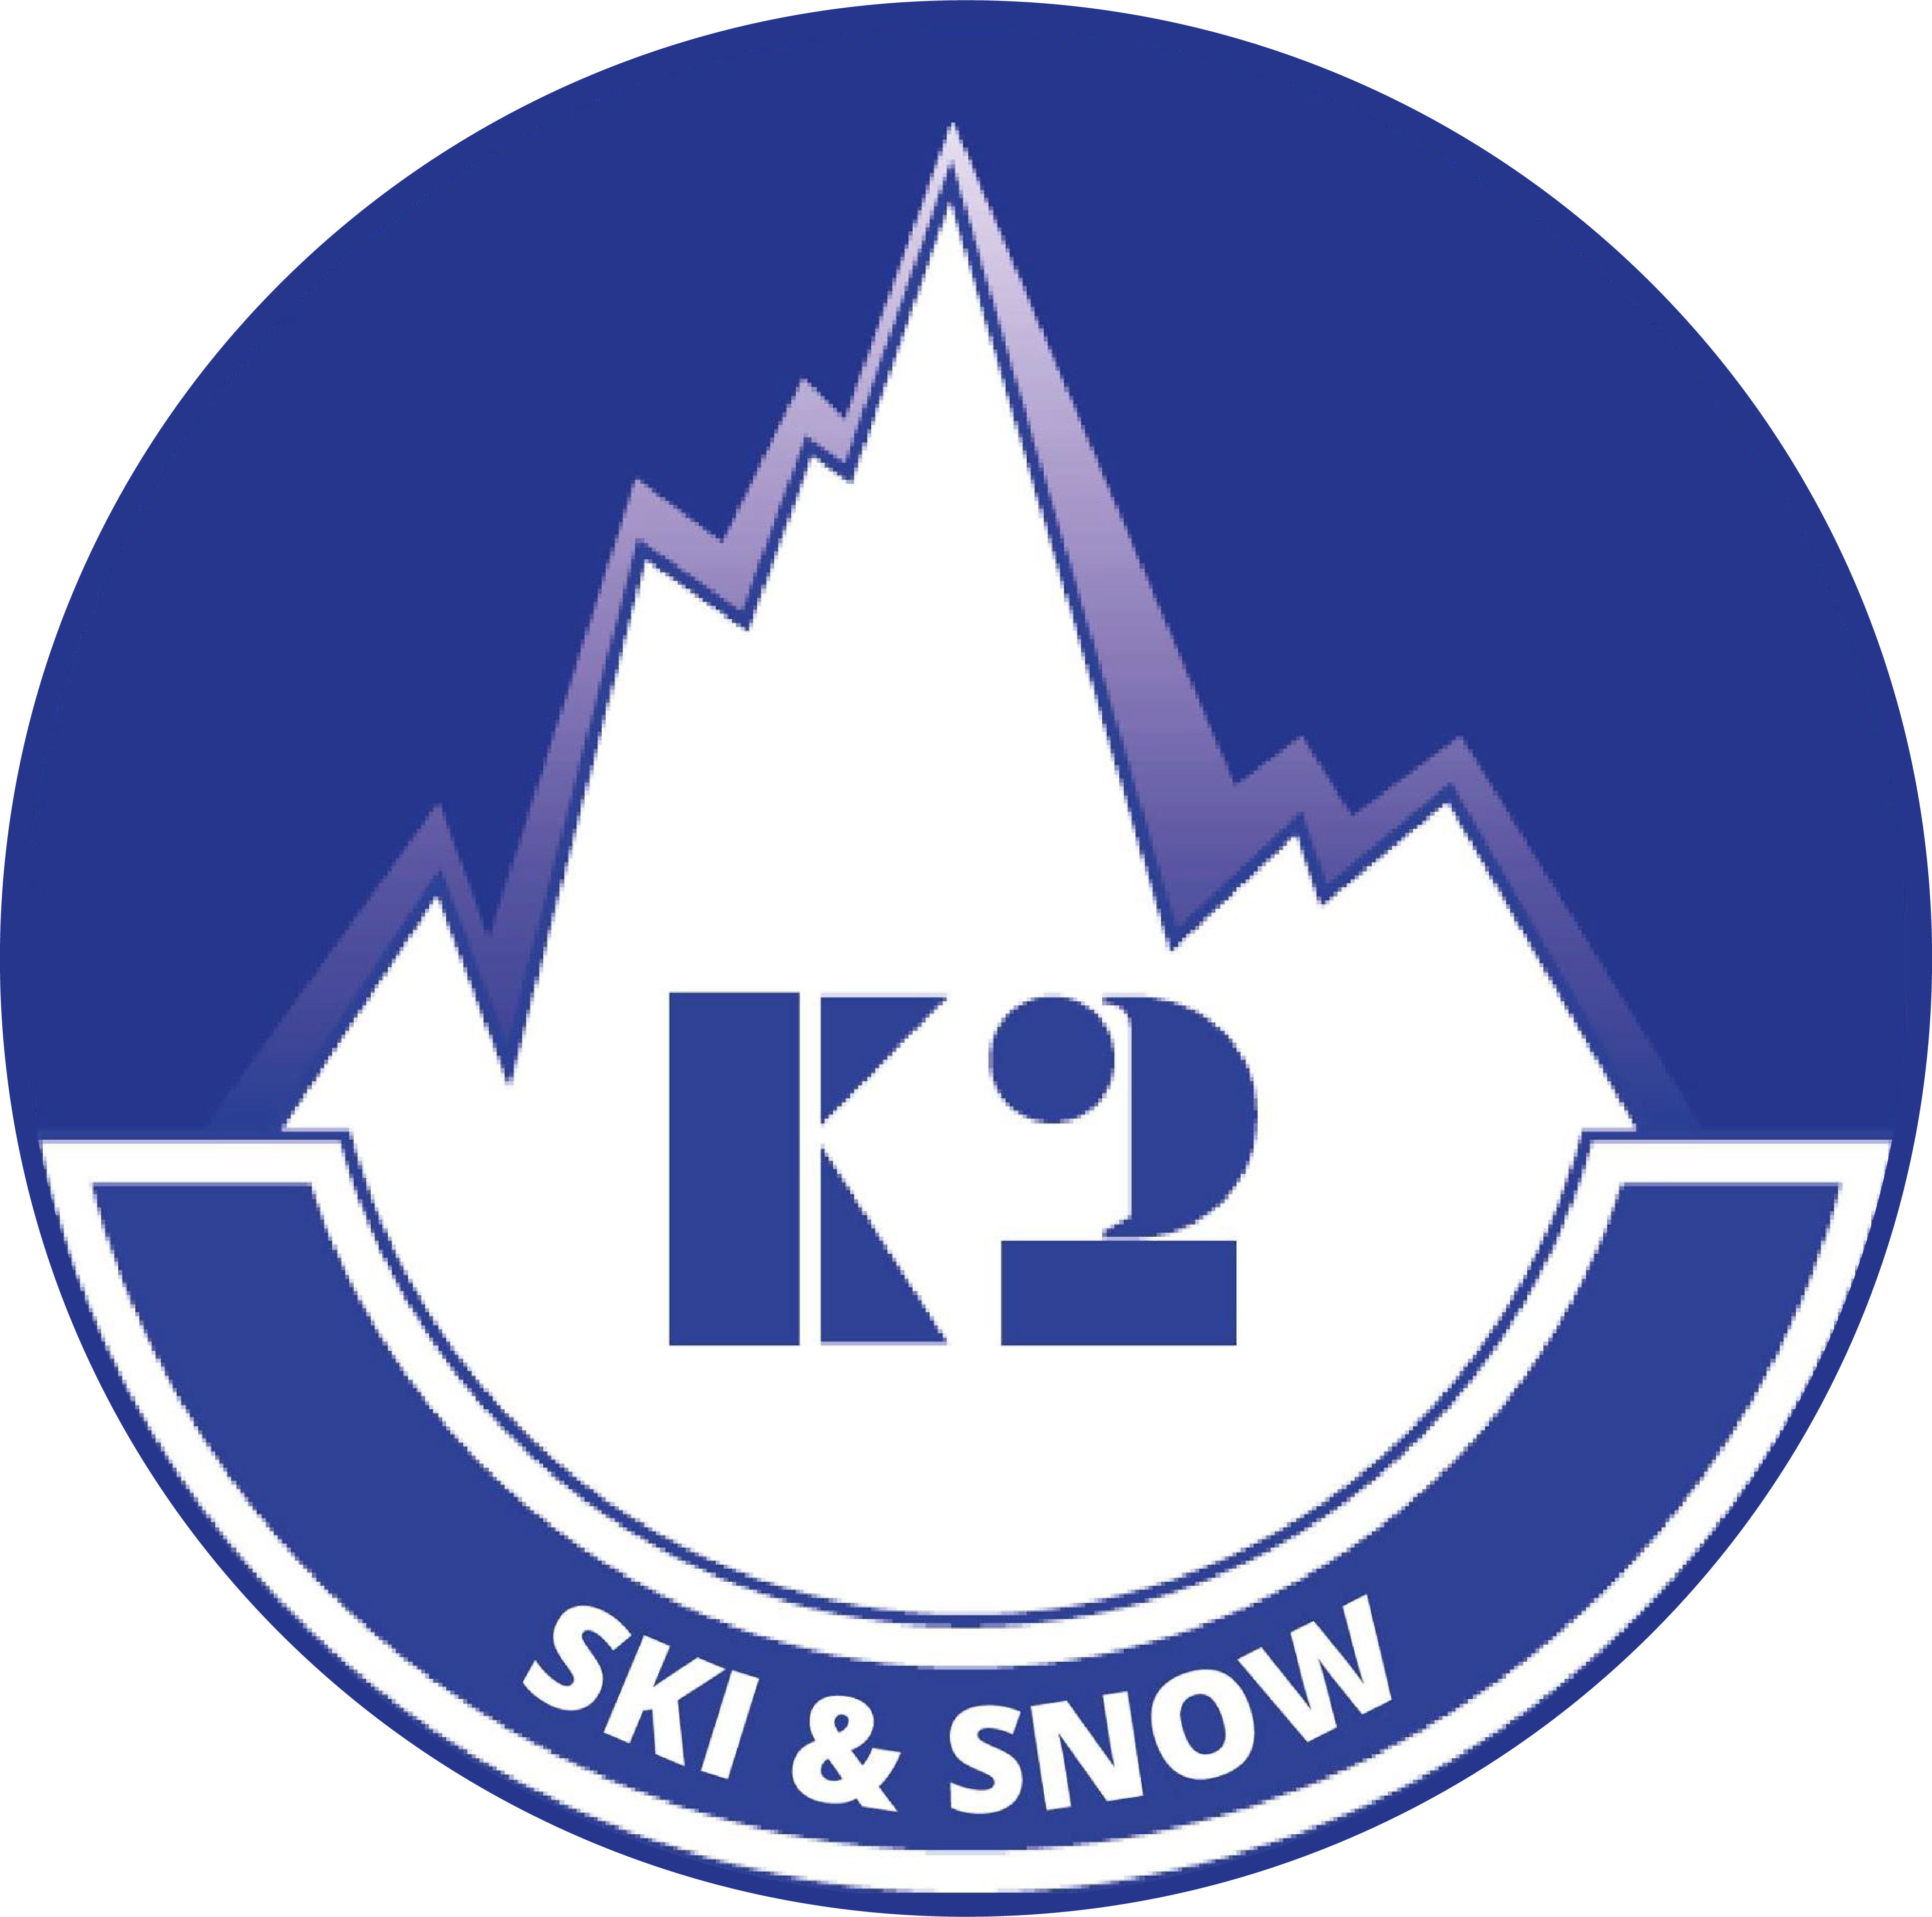 K2 Sport & skate